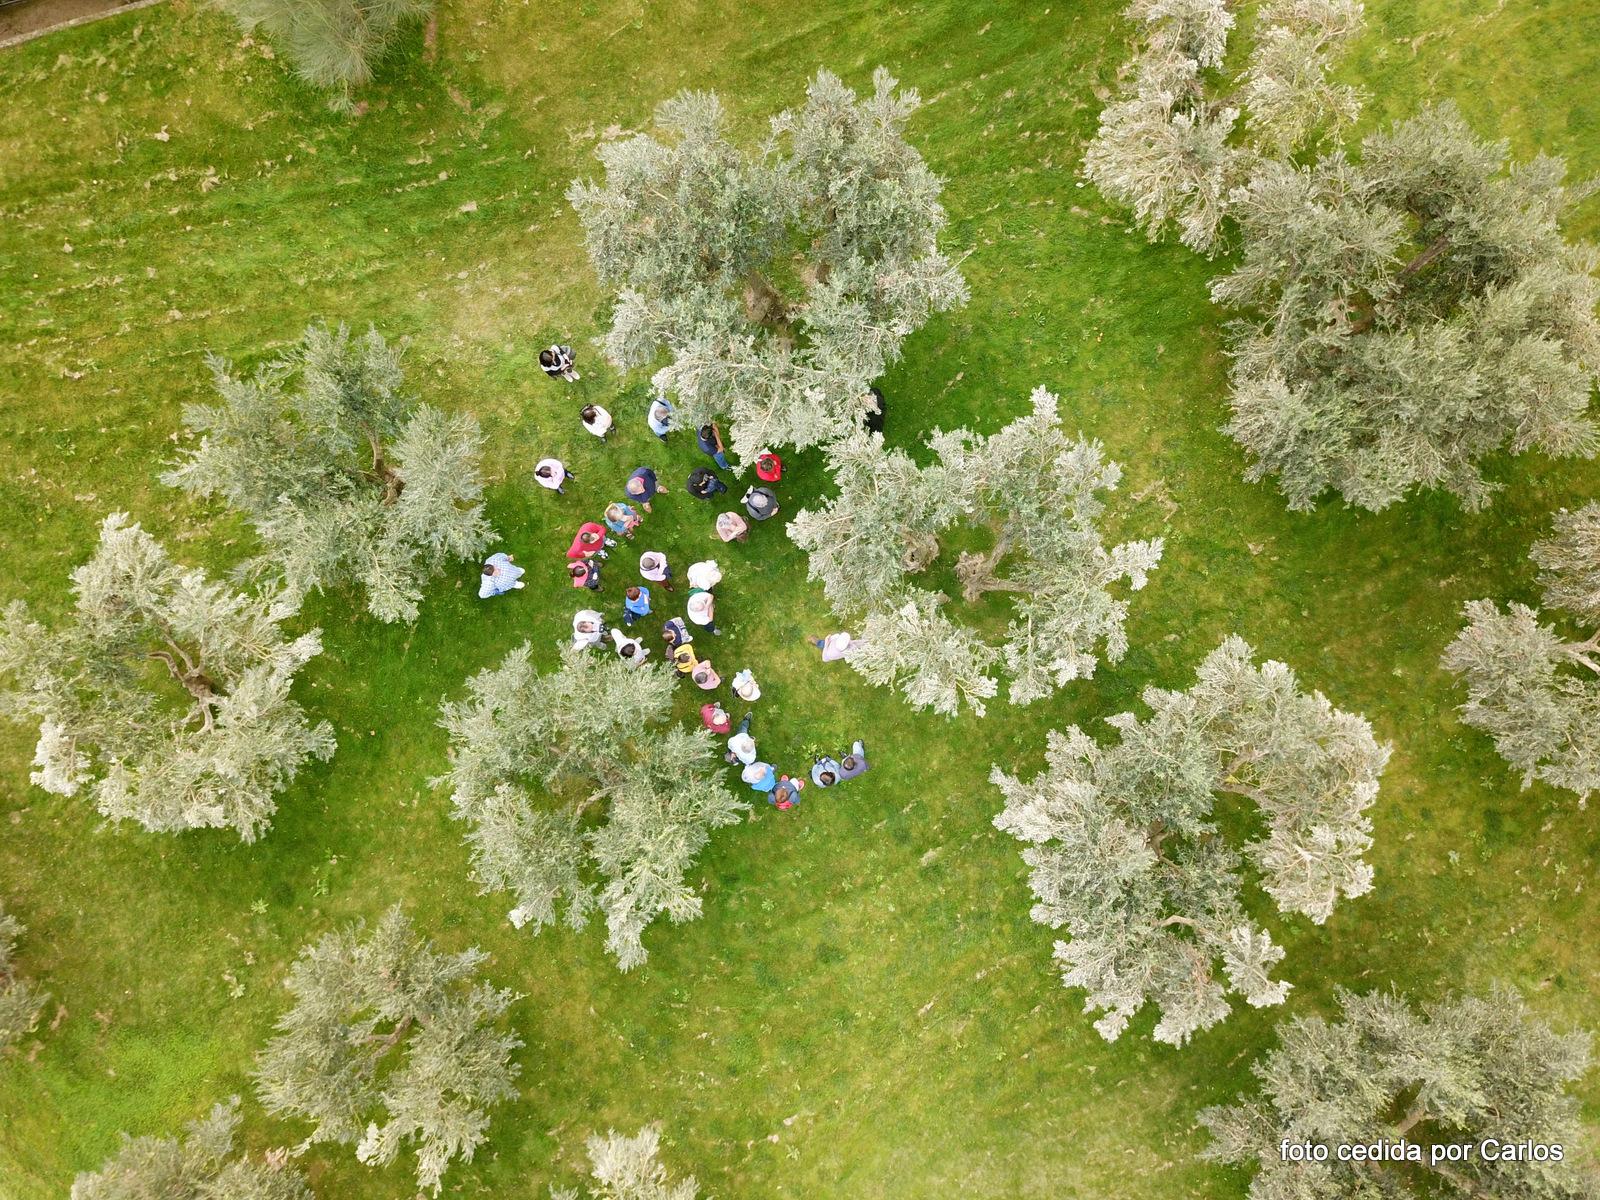 olivar Artajo a vista de dron